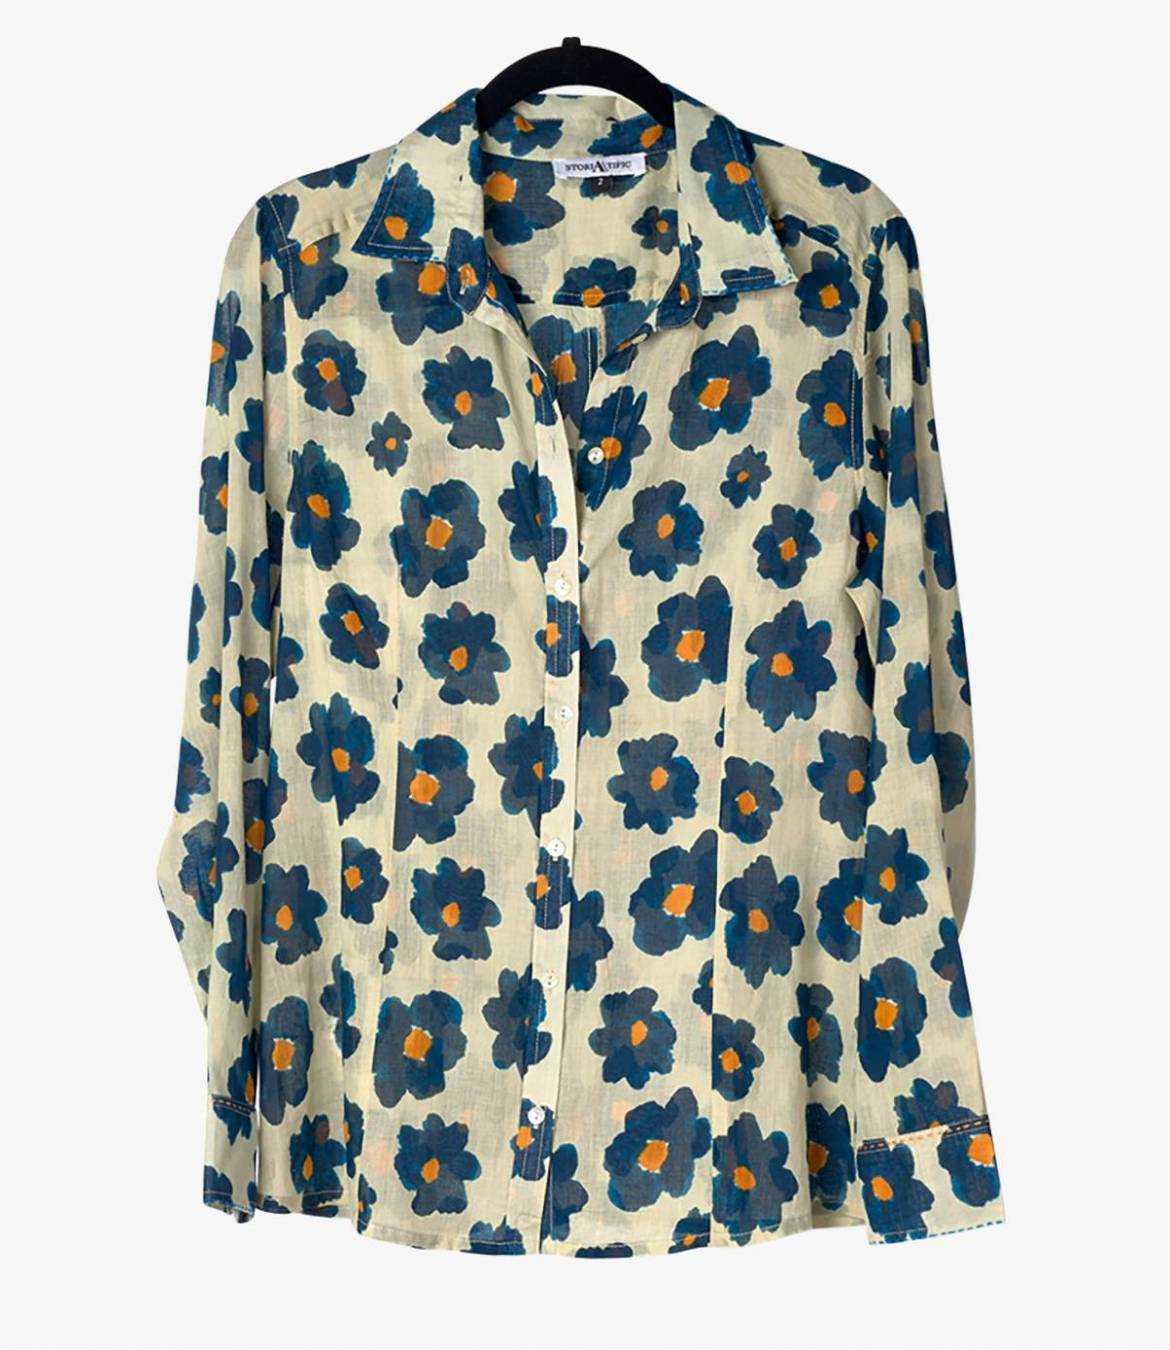 BONI ASTER Cotton Shirt for Women Storiatipic - 2